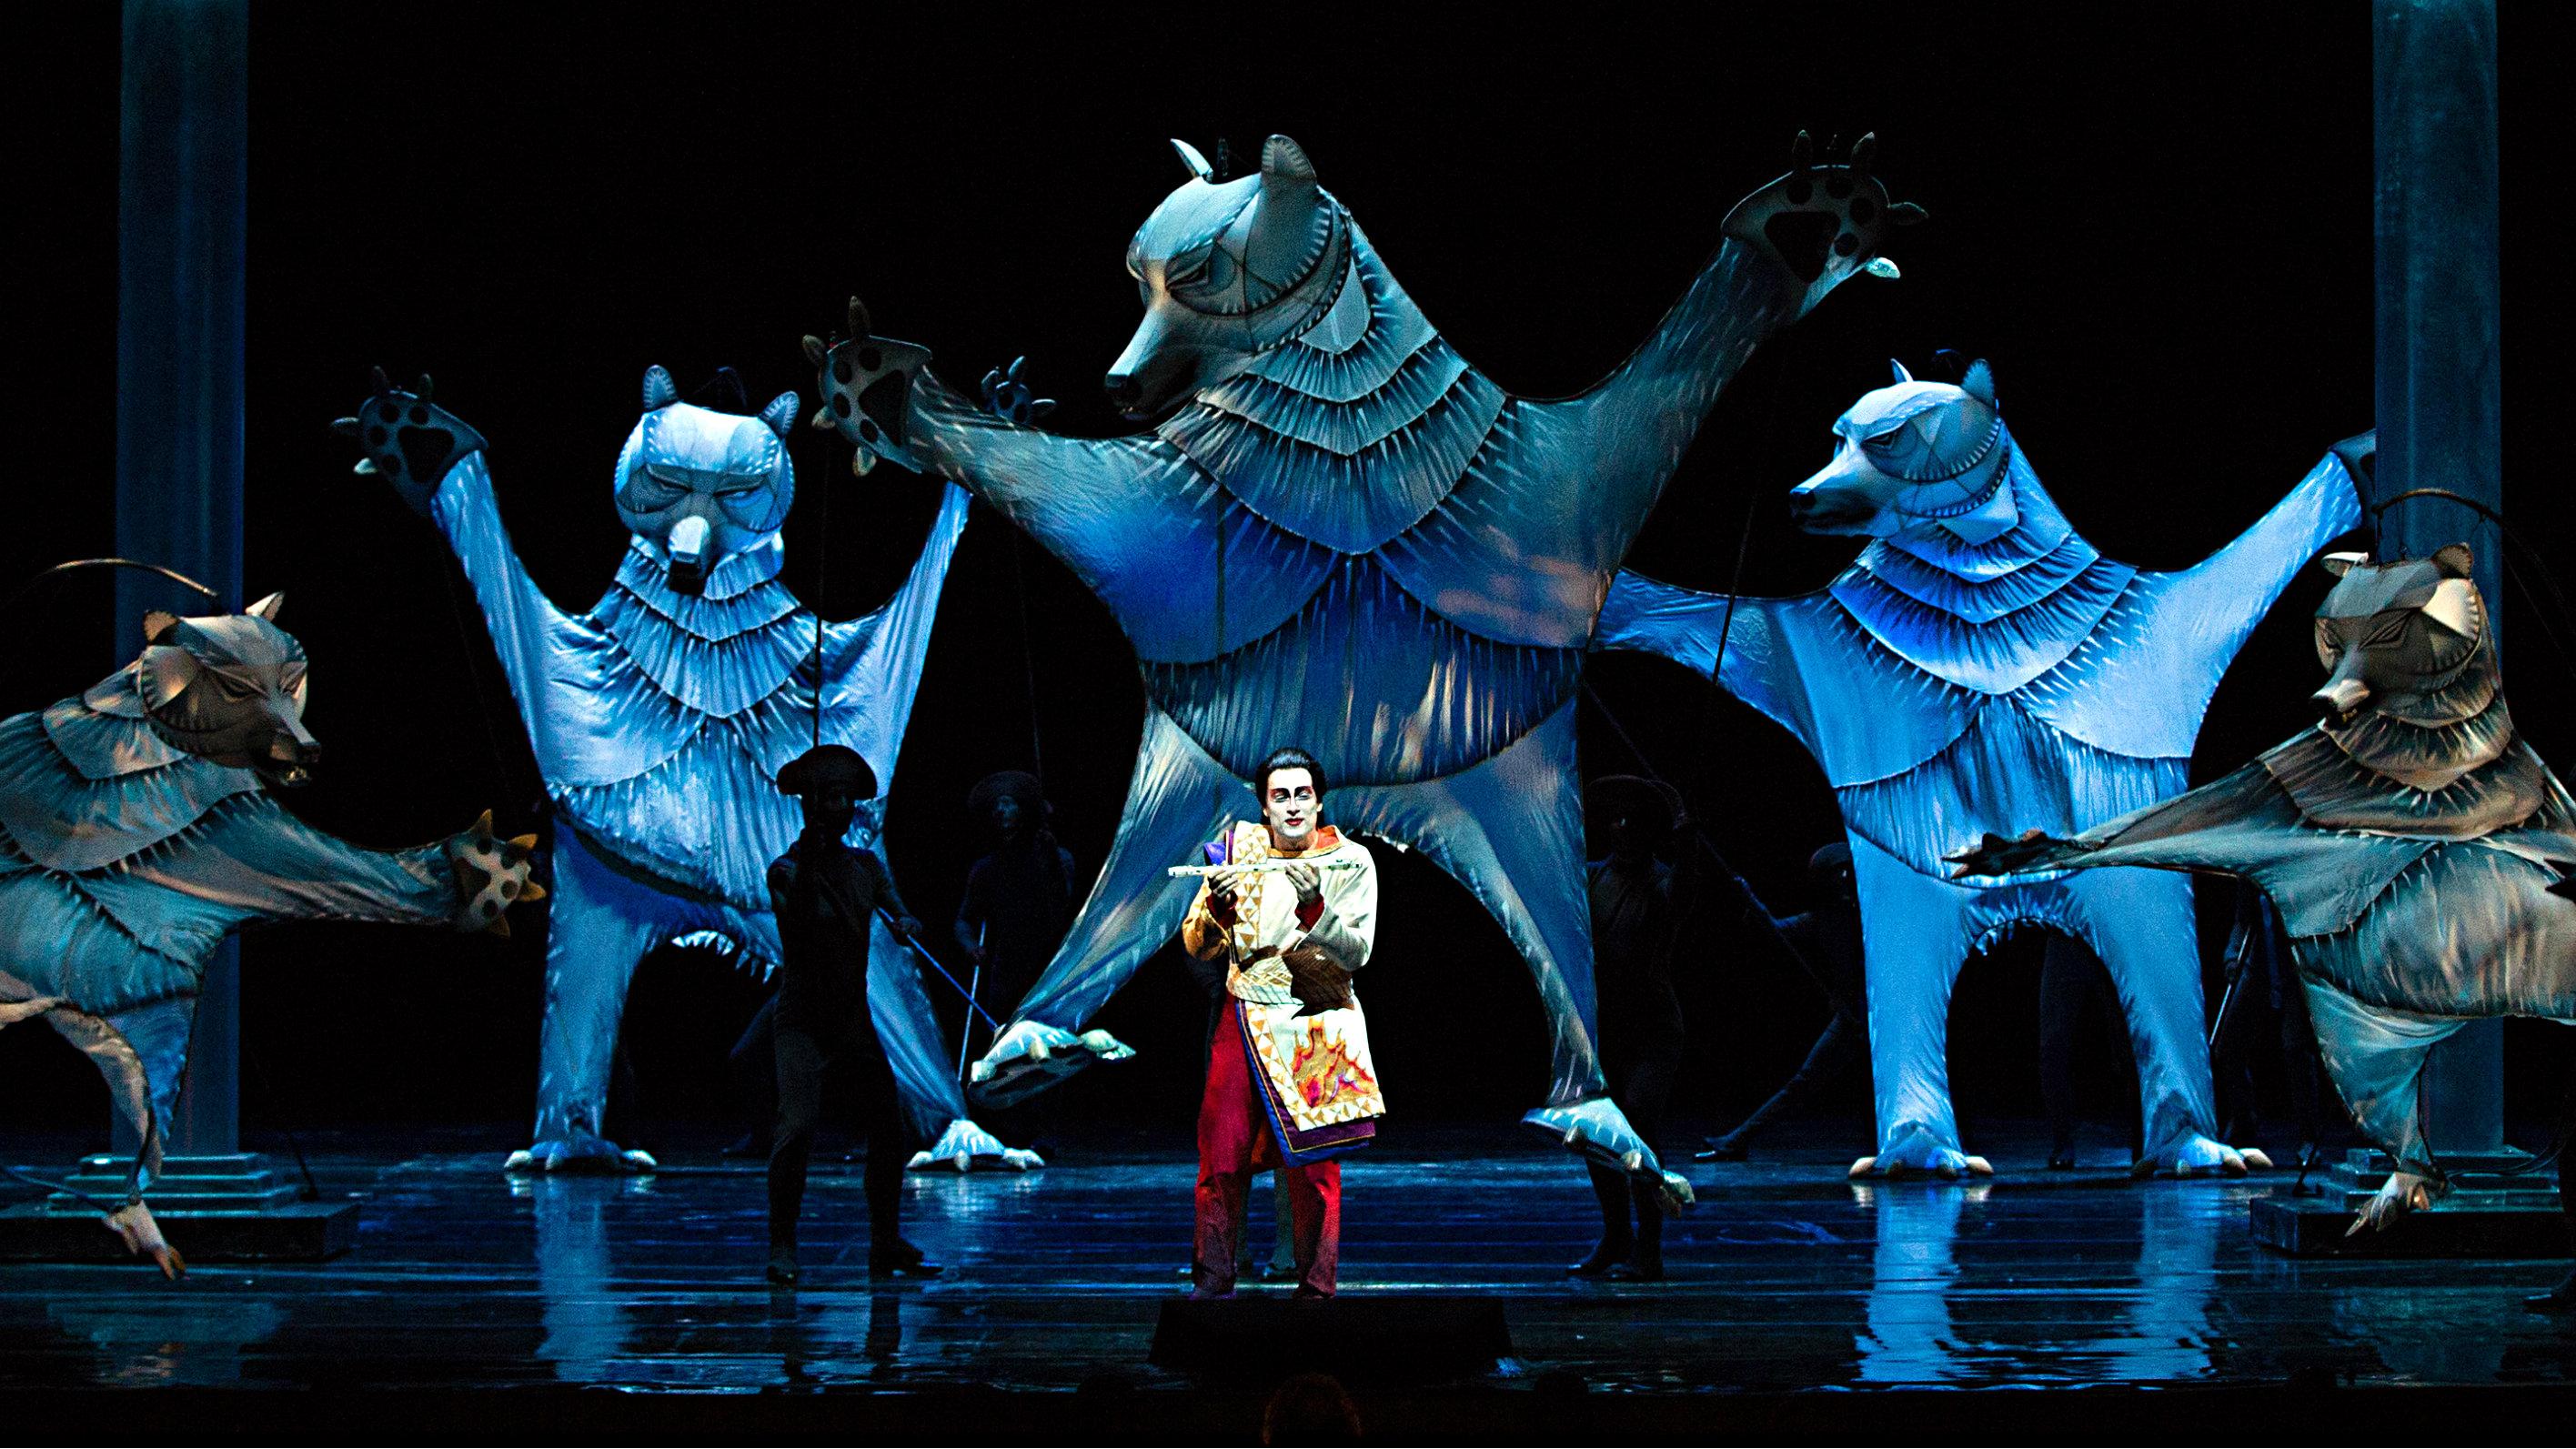 Met Opera Image: Magic Flute